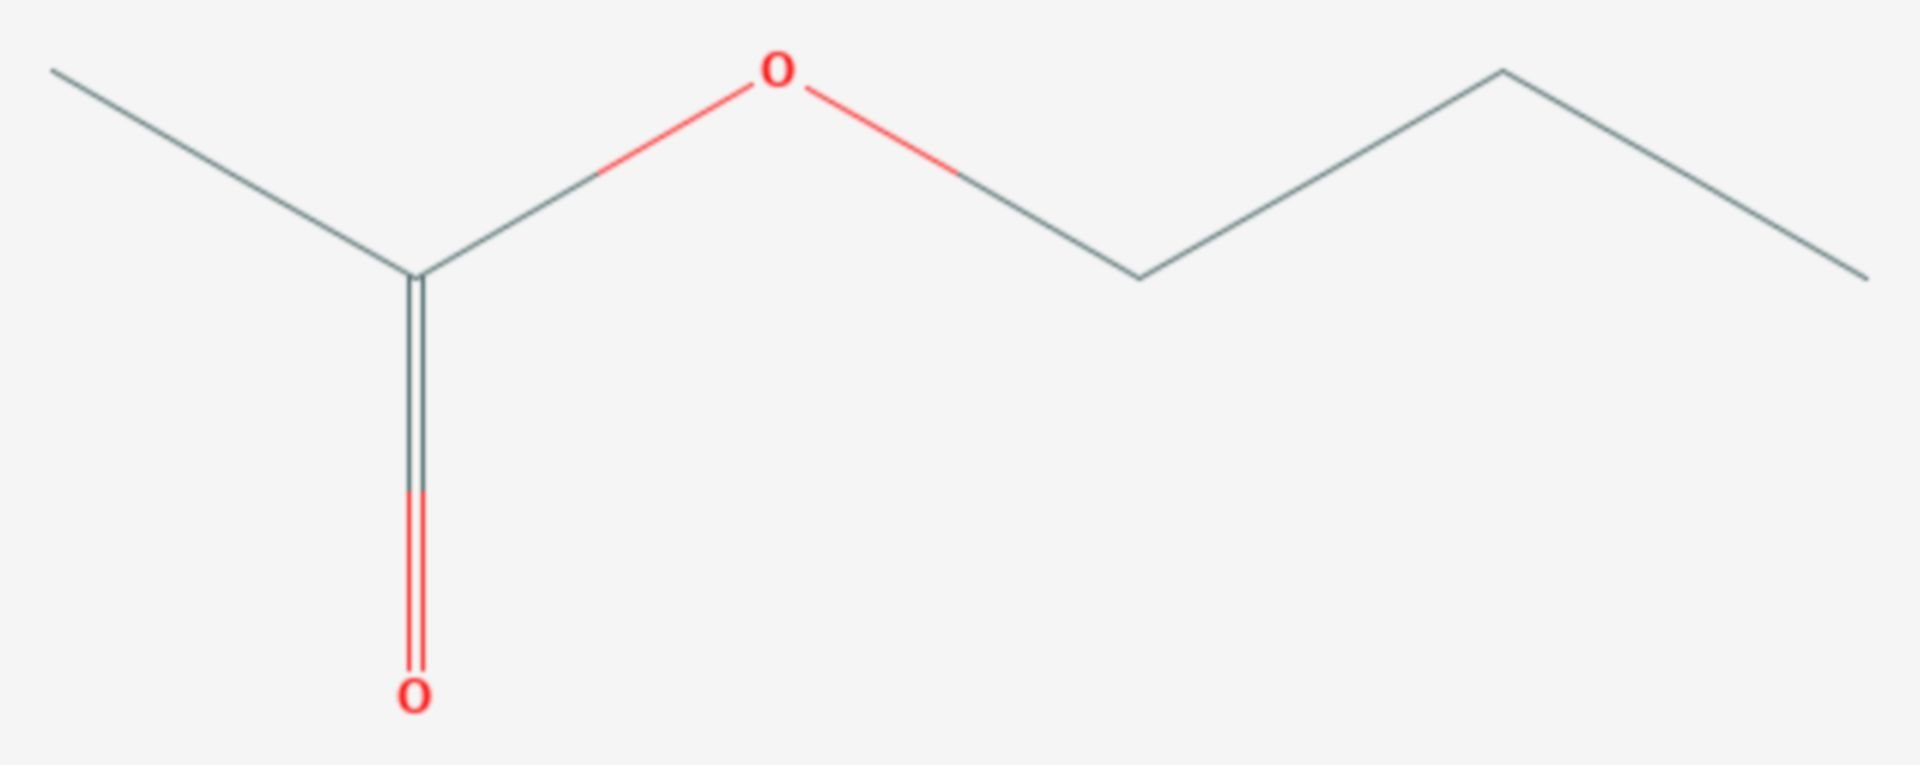 Essigsäure-n-propylester (Strukturformel)